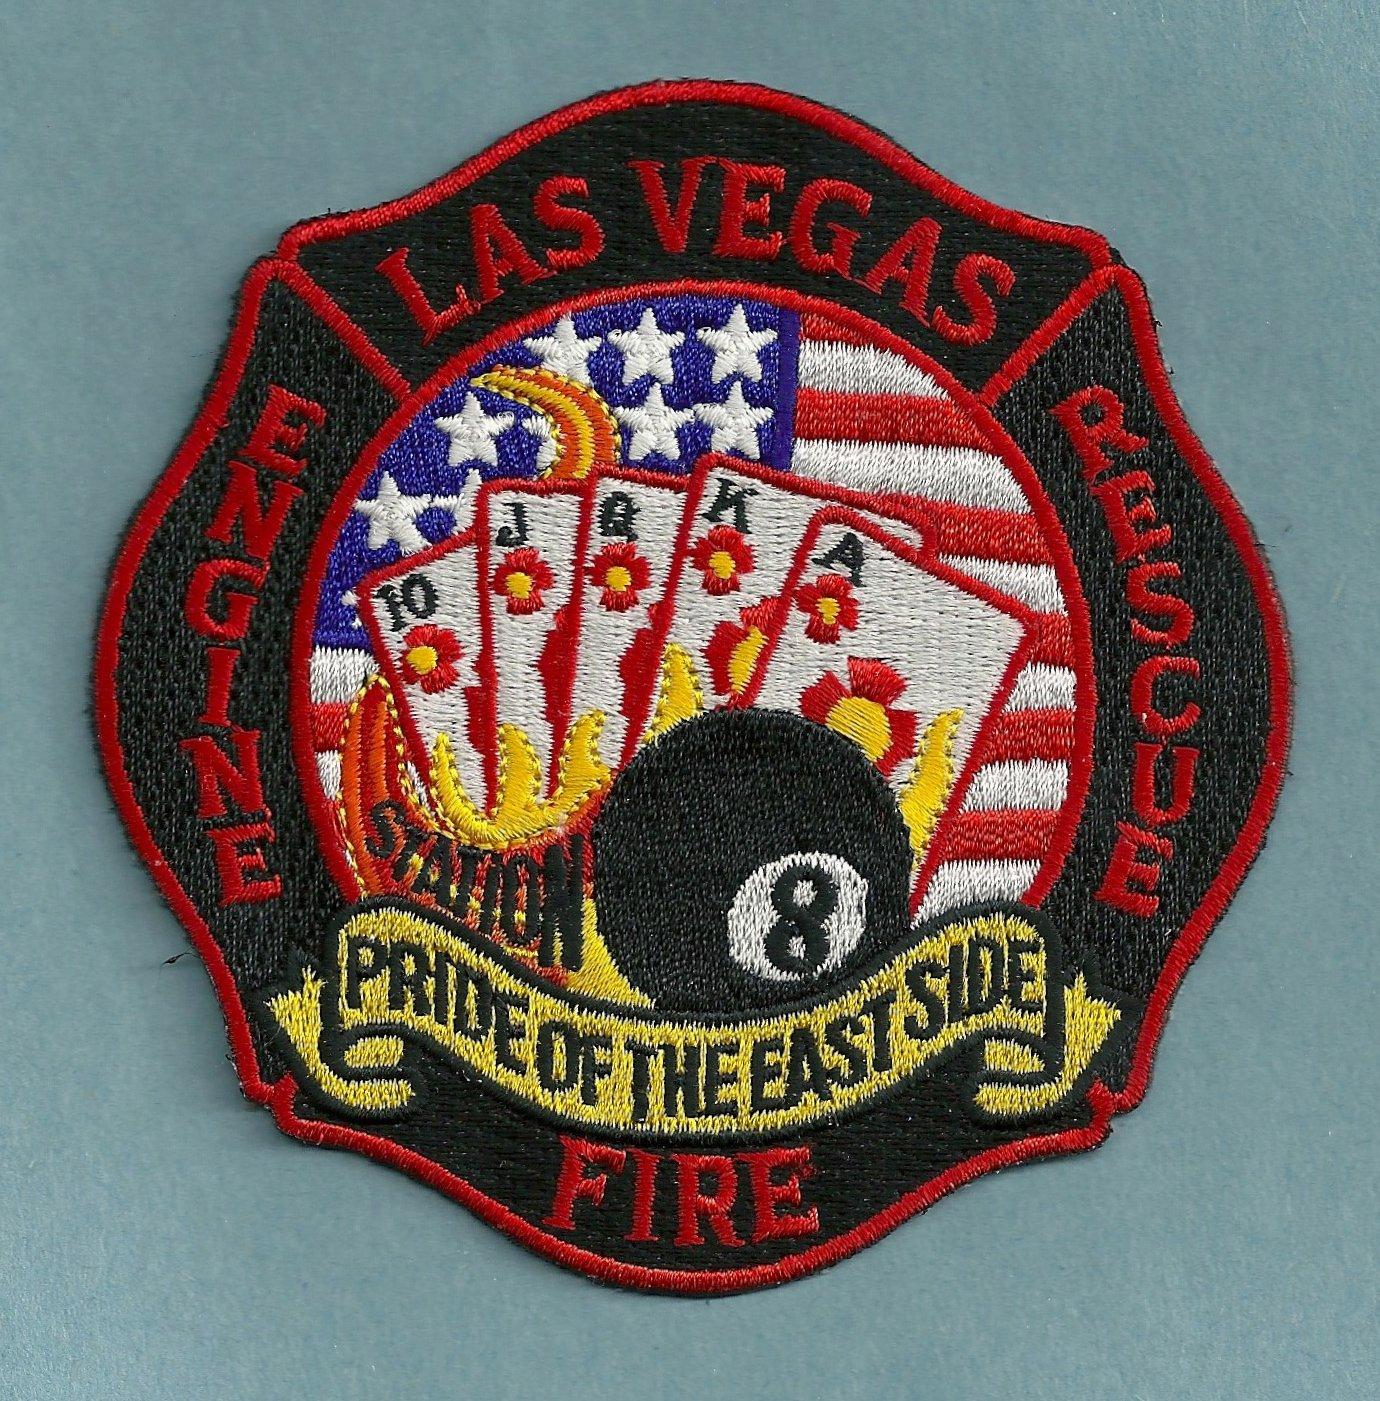 Las Vegas Fire Department Engine 8 Rescue 8 Company Patch